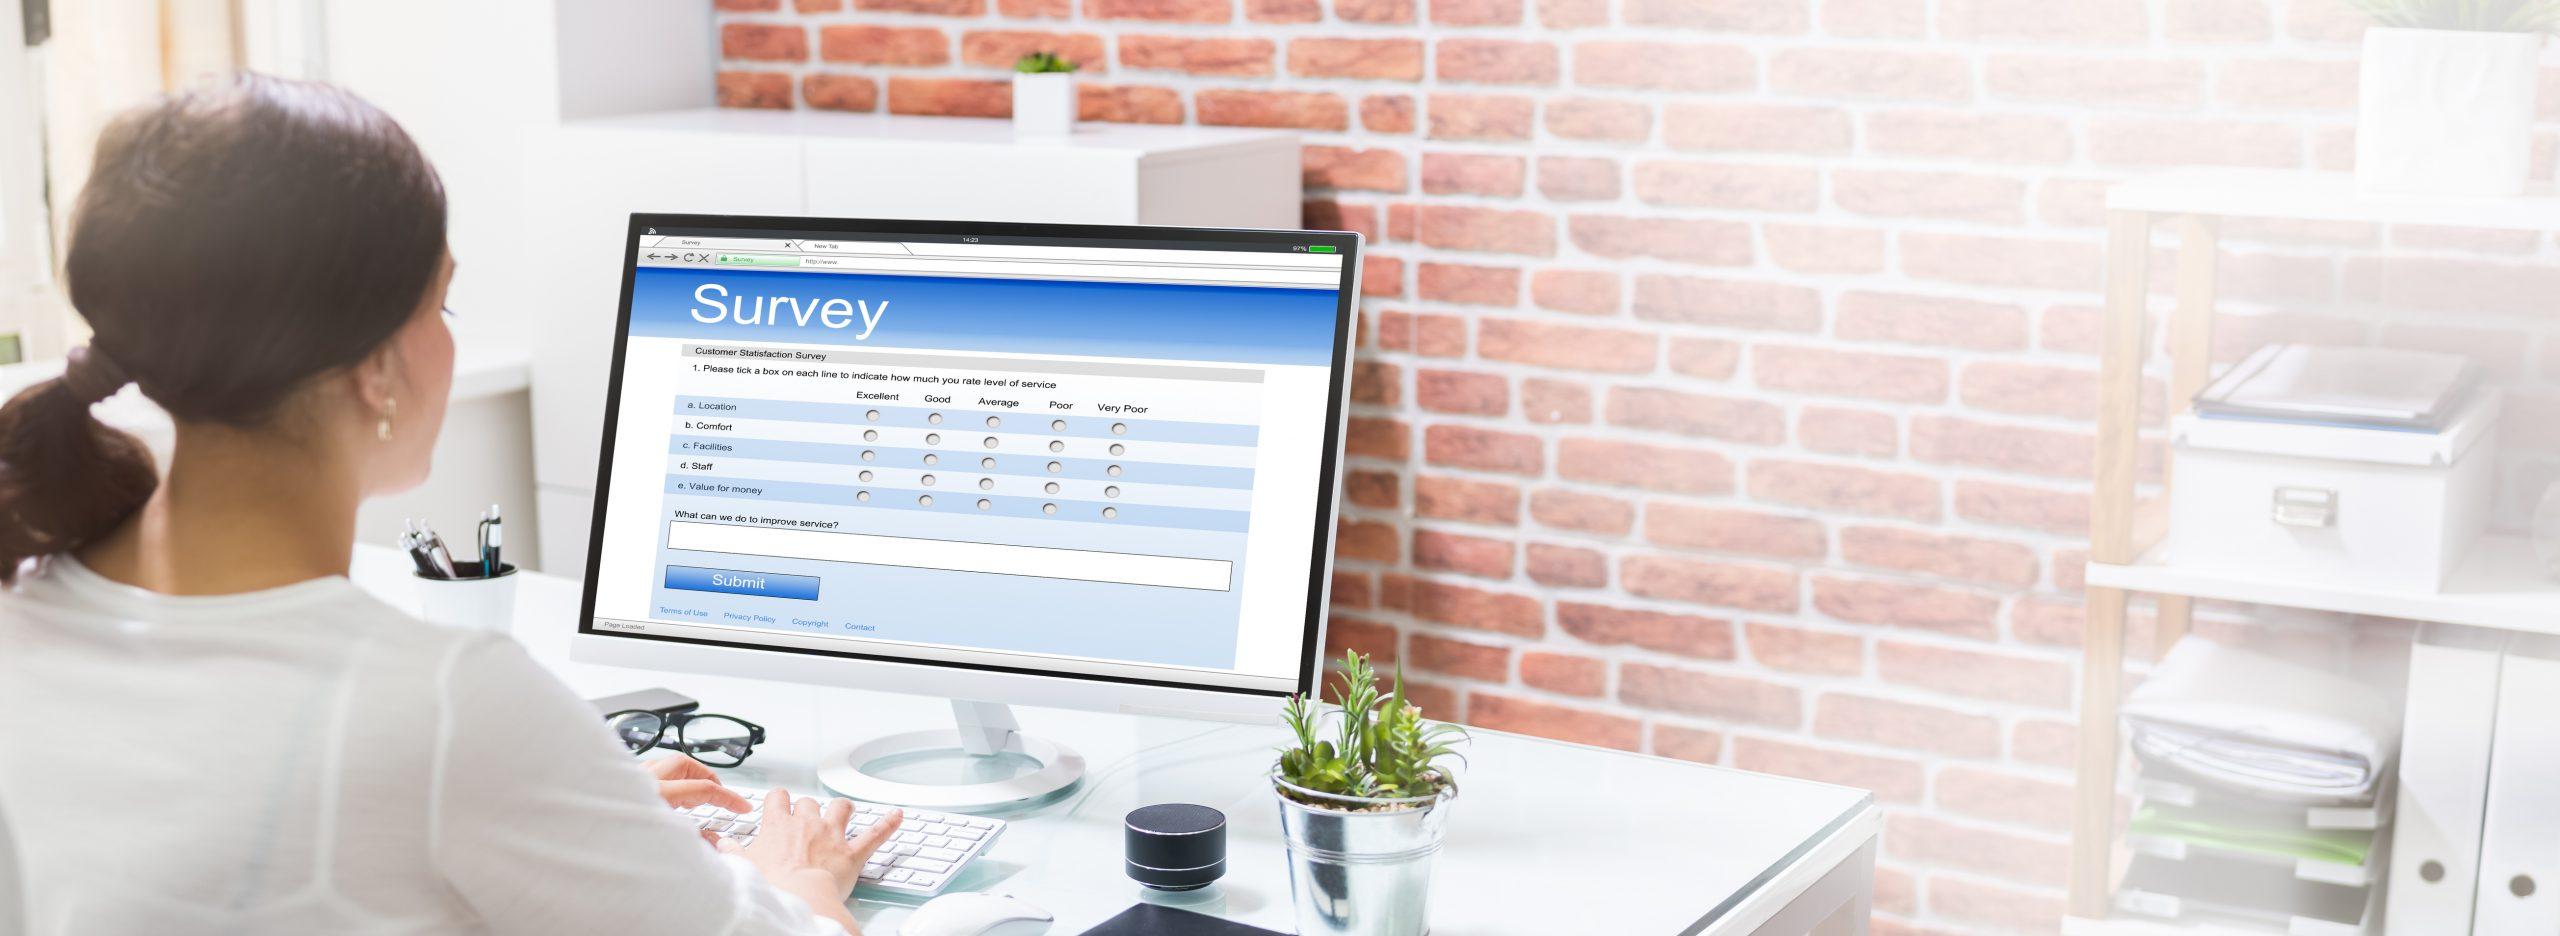 menopause survey, evaluation, results